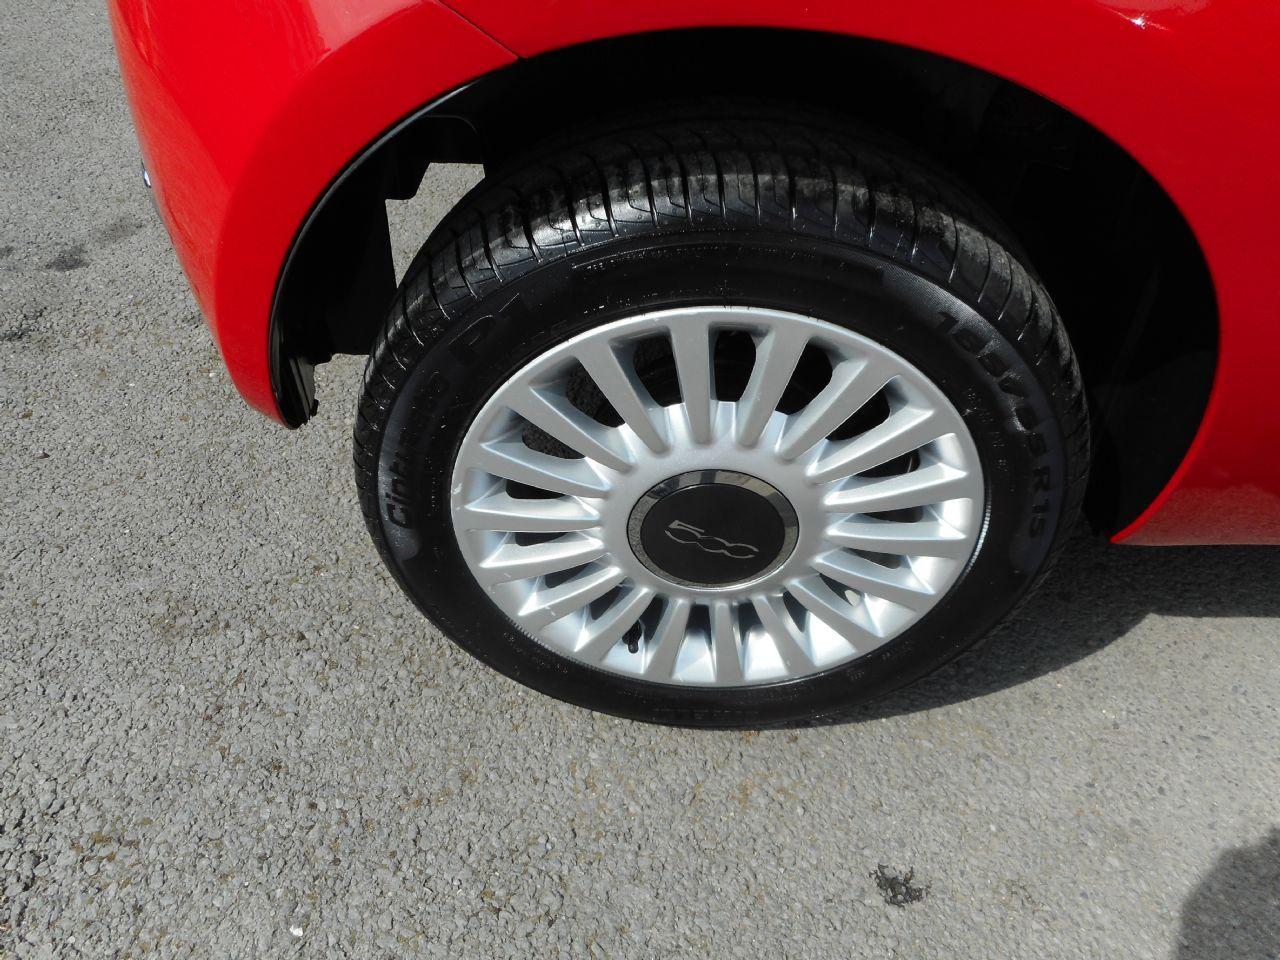 FIAT 500 1.2i Lounge S/S AUTO (2011) - Picture 4